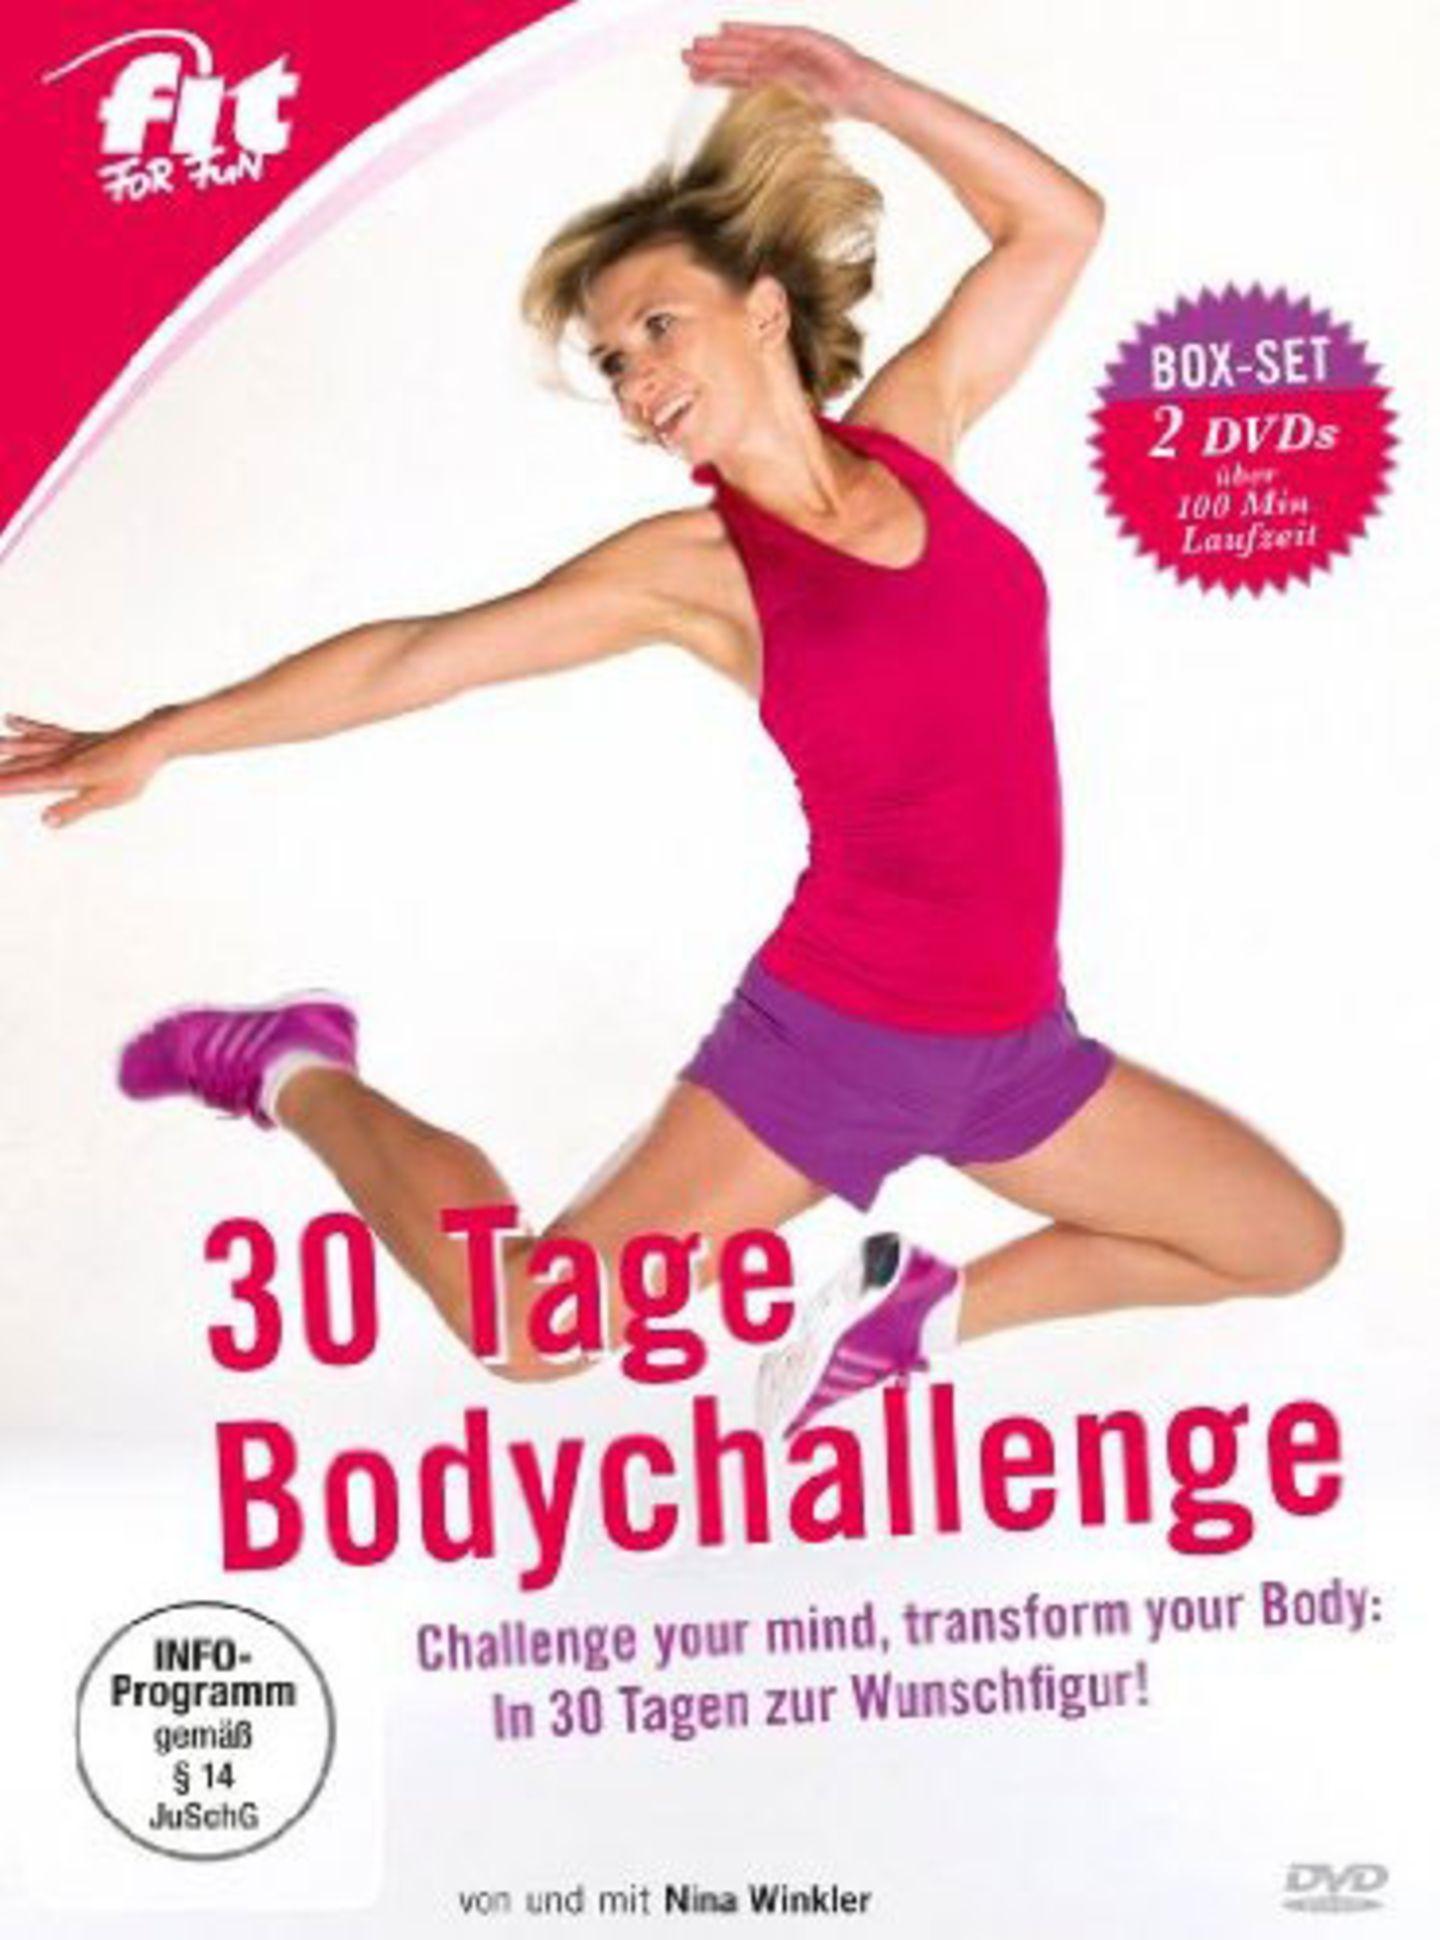 30 Tage Bodychallenge